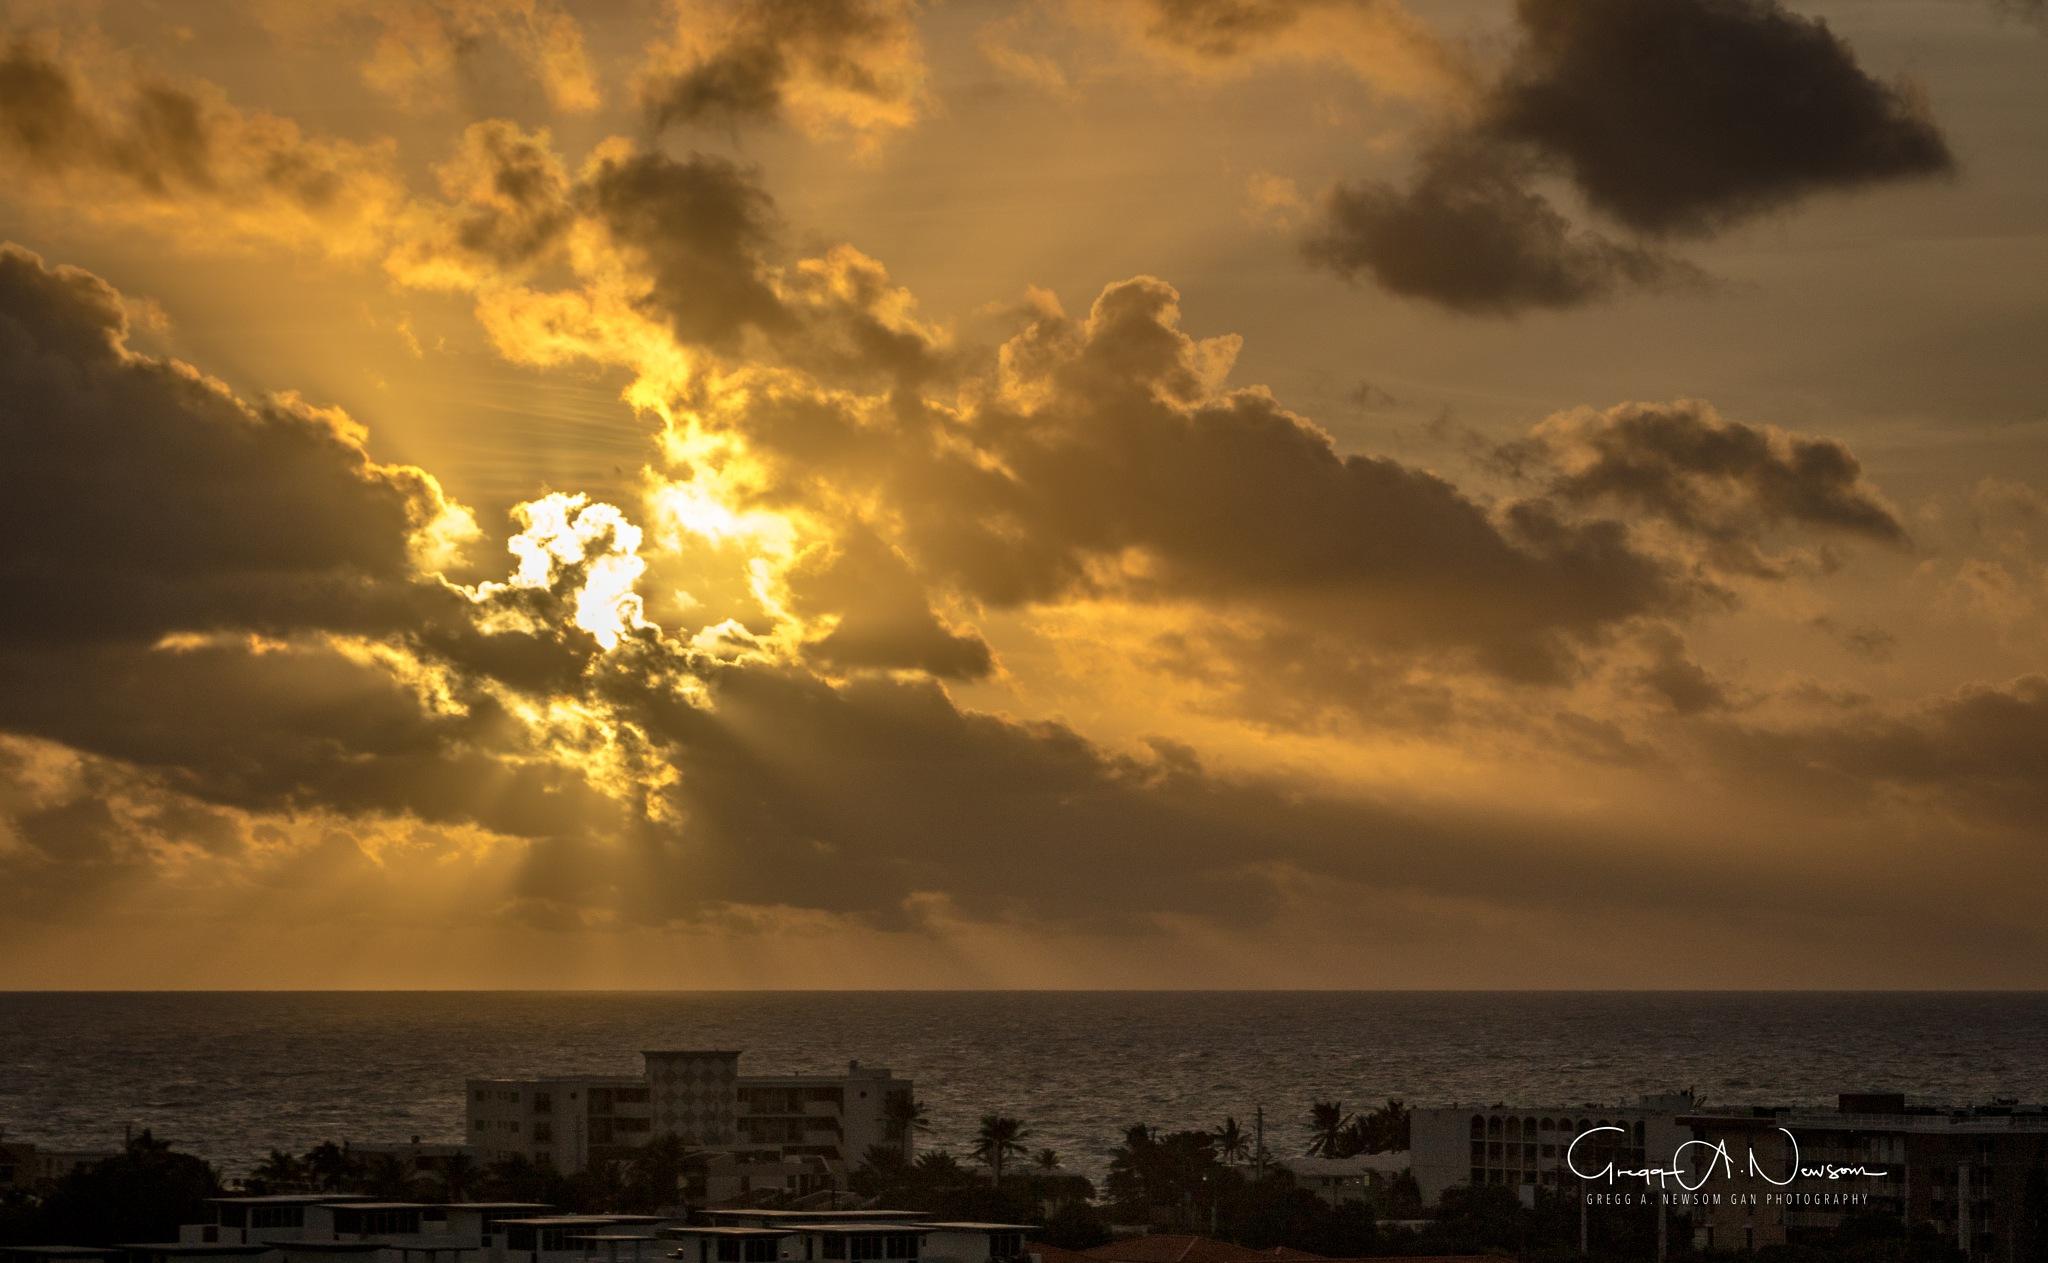 Last sunrise today by Gnewsom324